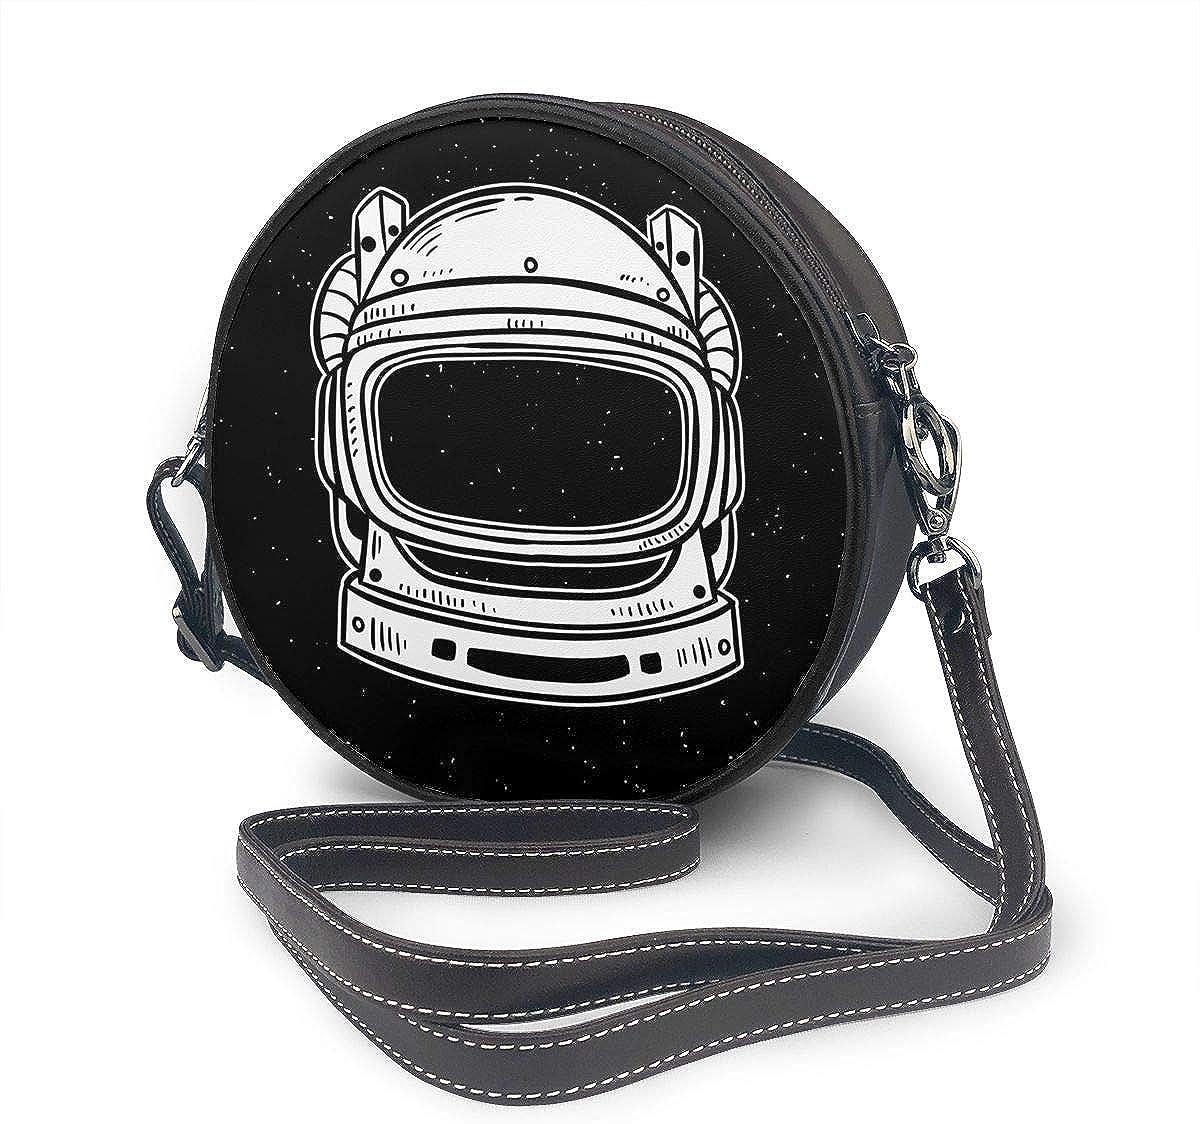 Circular Leather Shoulder Bag,Zipper Crossbody Purse Handbag Bag For Womens Grils Astronaut Space Doodle